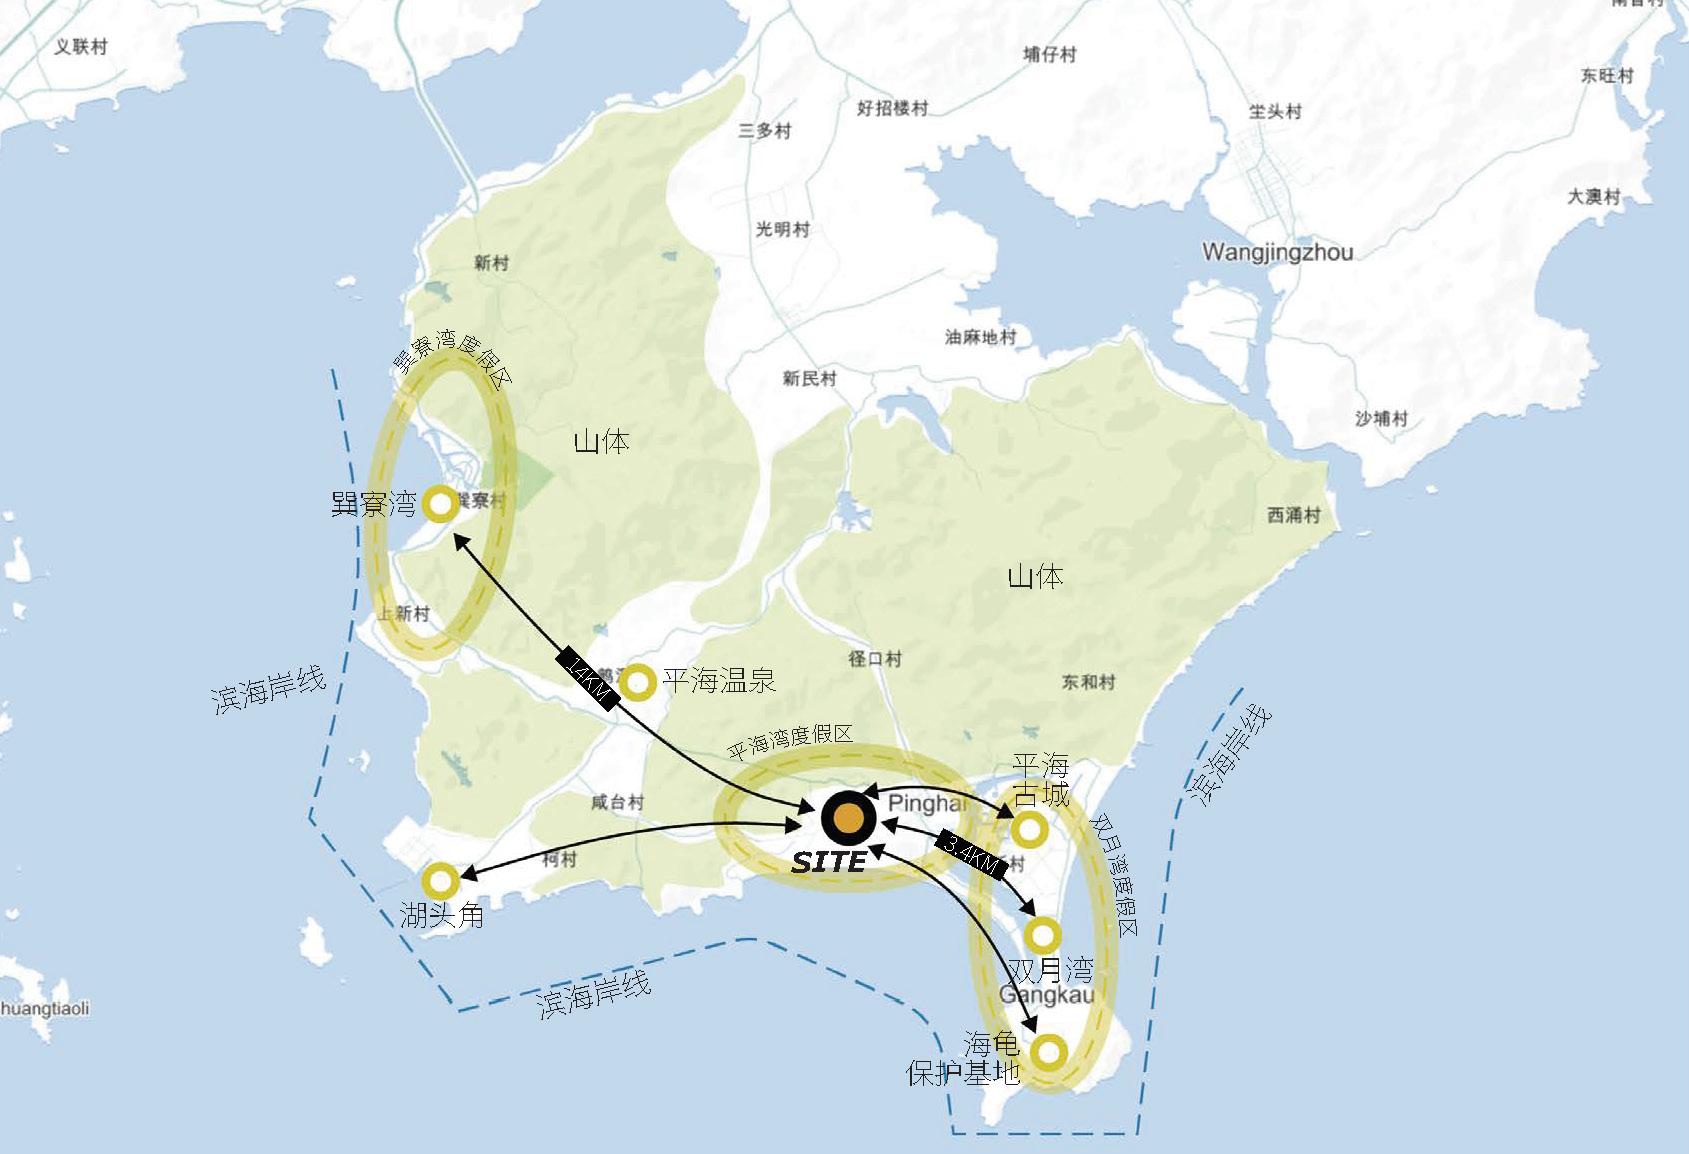 Pinghai Resort Area 平海度假区